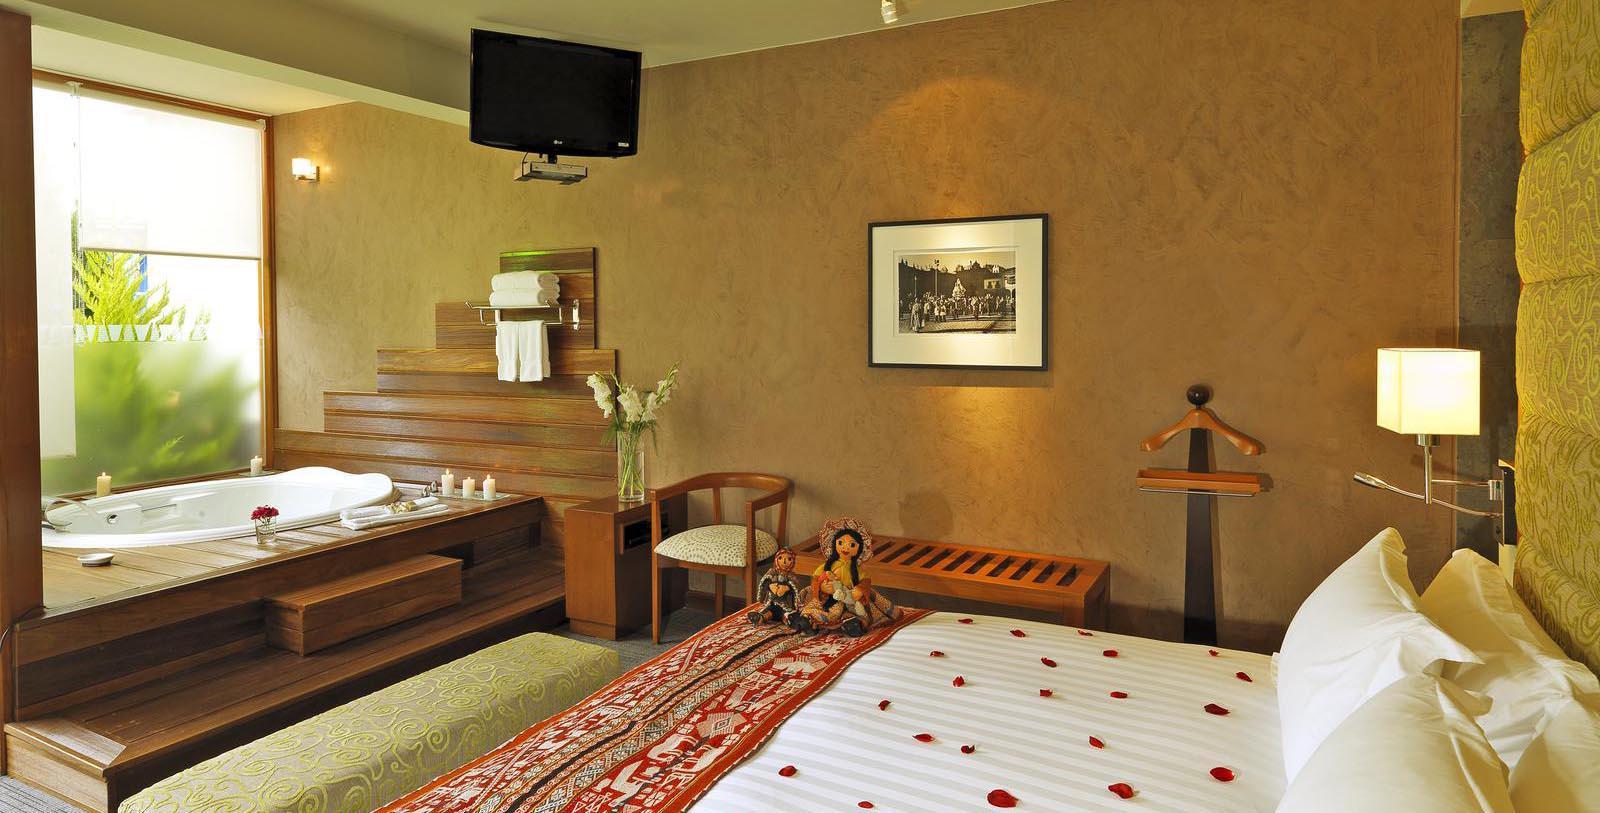 Image of guestroom Aranwa Sacred Valley, 1900, Member of Historic Hotels Worldwide, in Urubamba, Peru, Accommodations